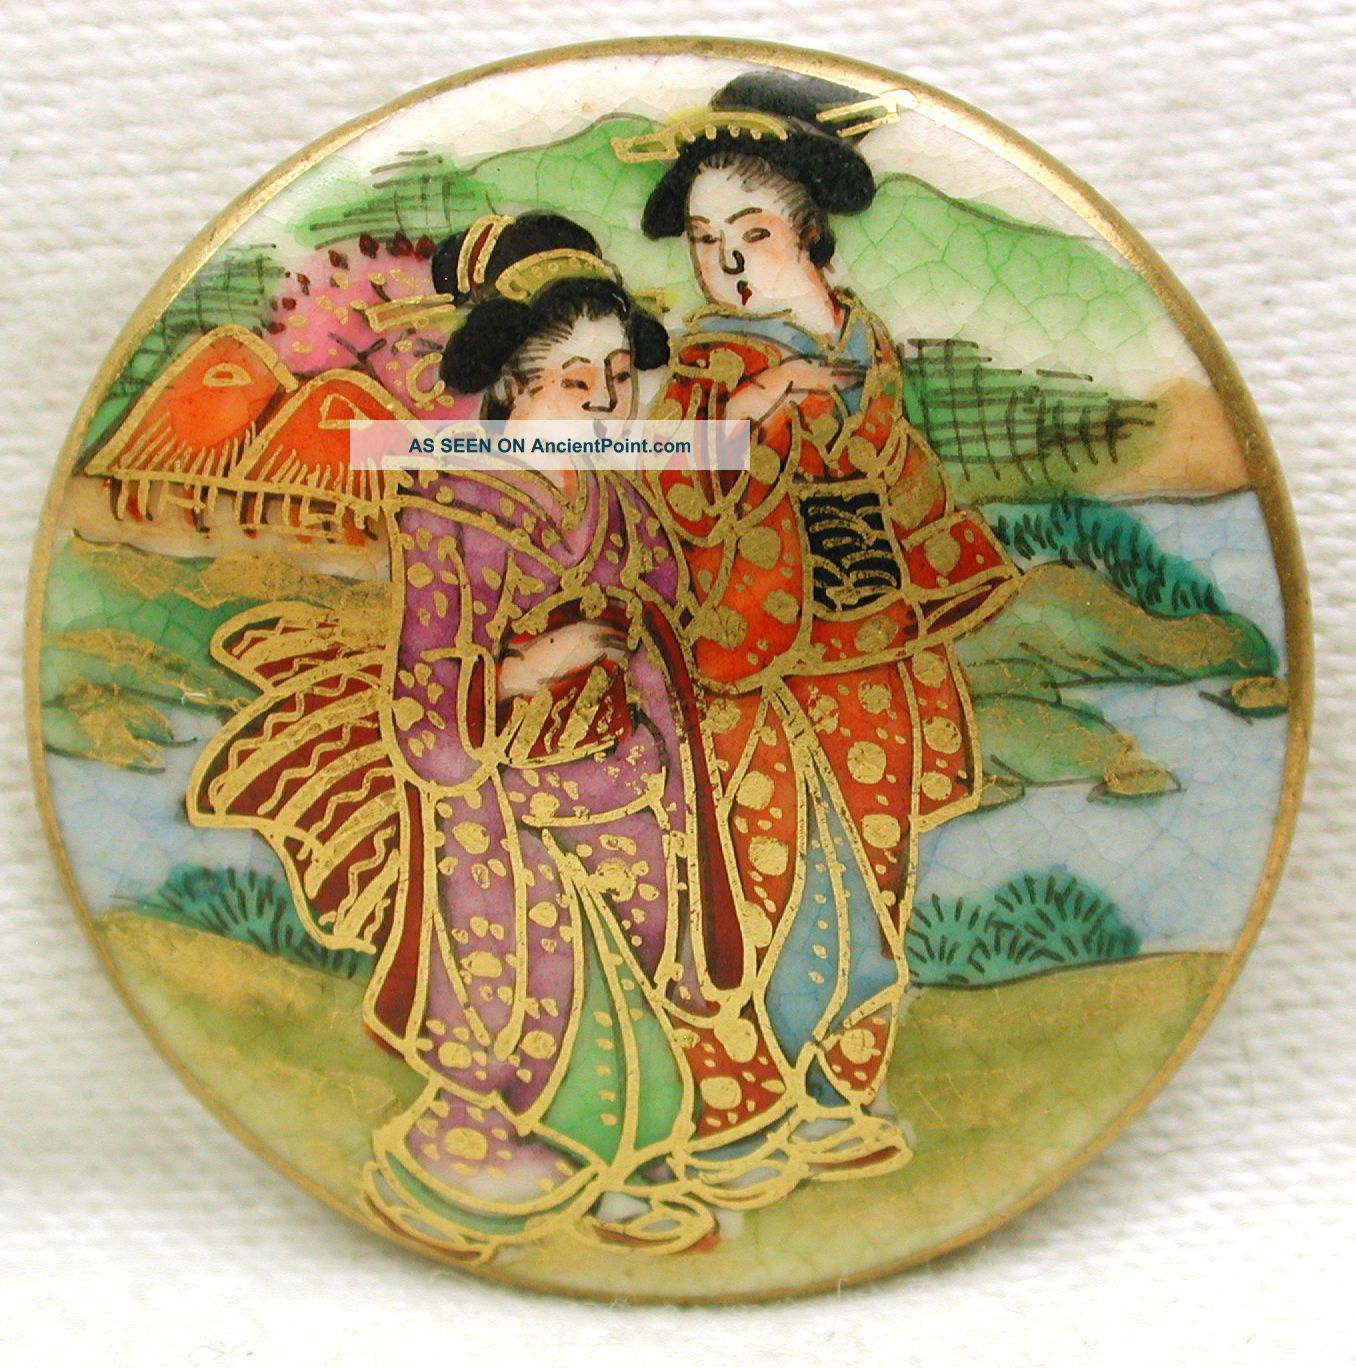 Lg Vintage Satsuma Button Hand Paint 2 Geisha In Kimonos W/gold Accents 1 & 1/4